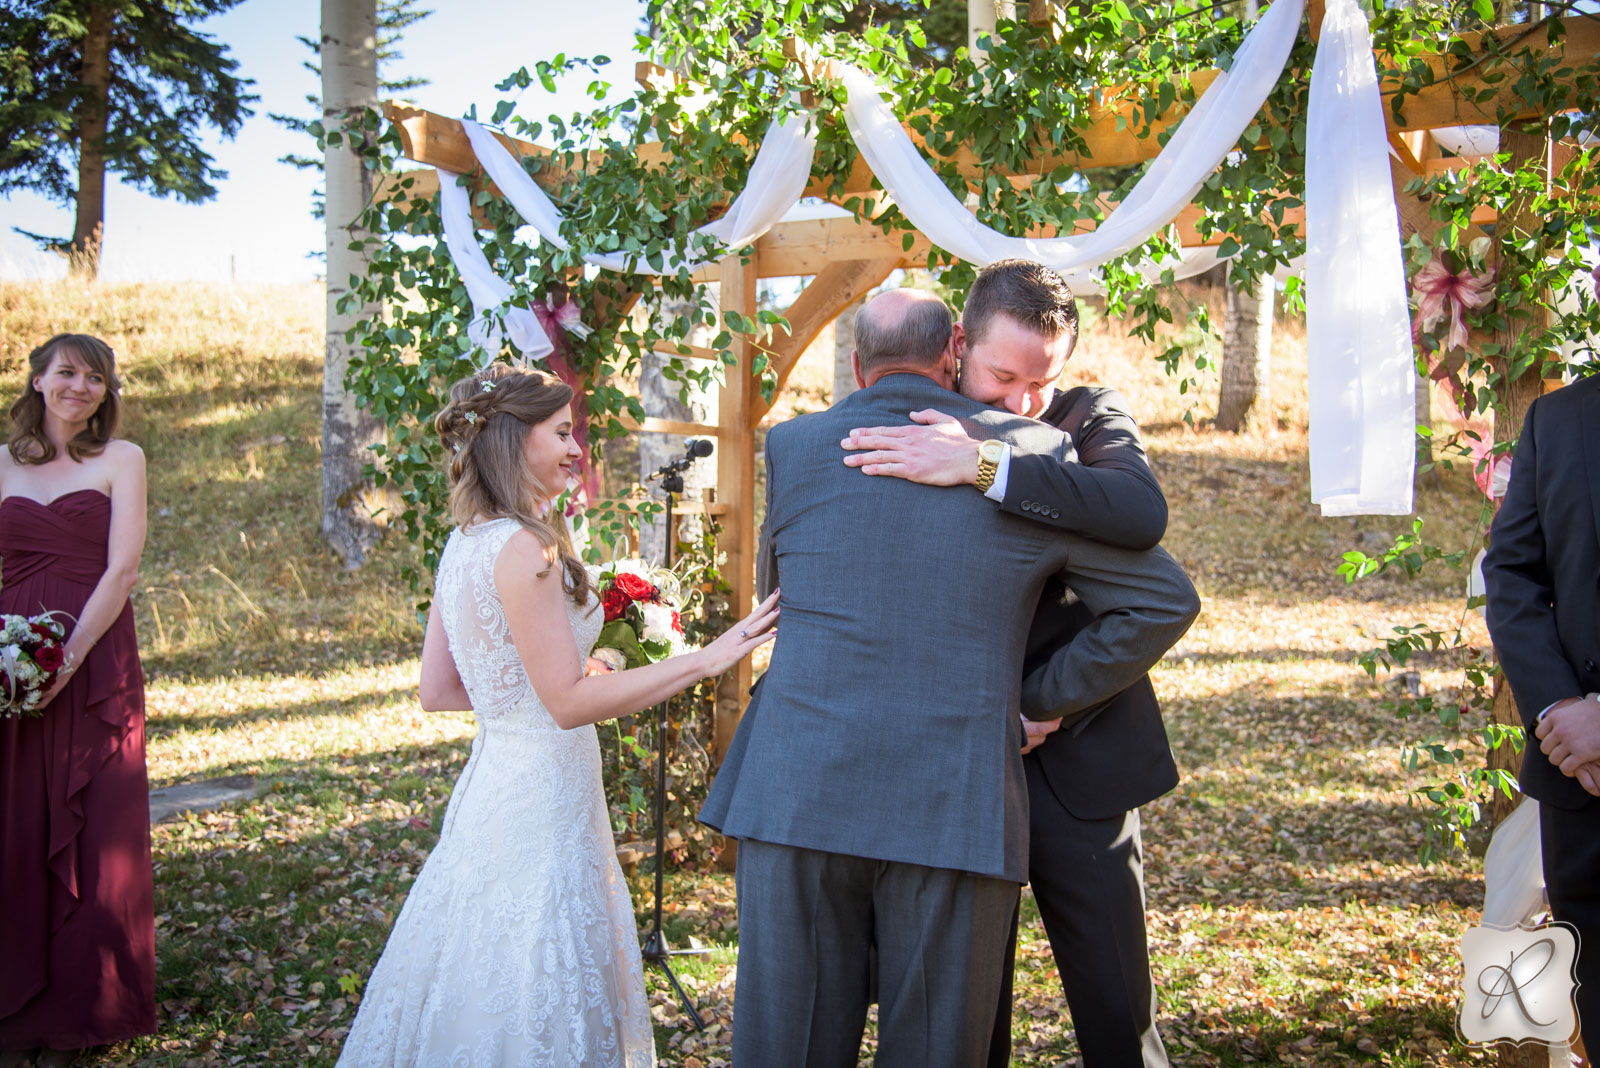 Father walking bride down isle